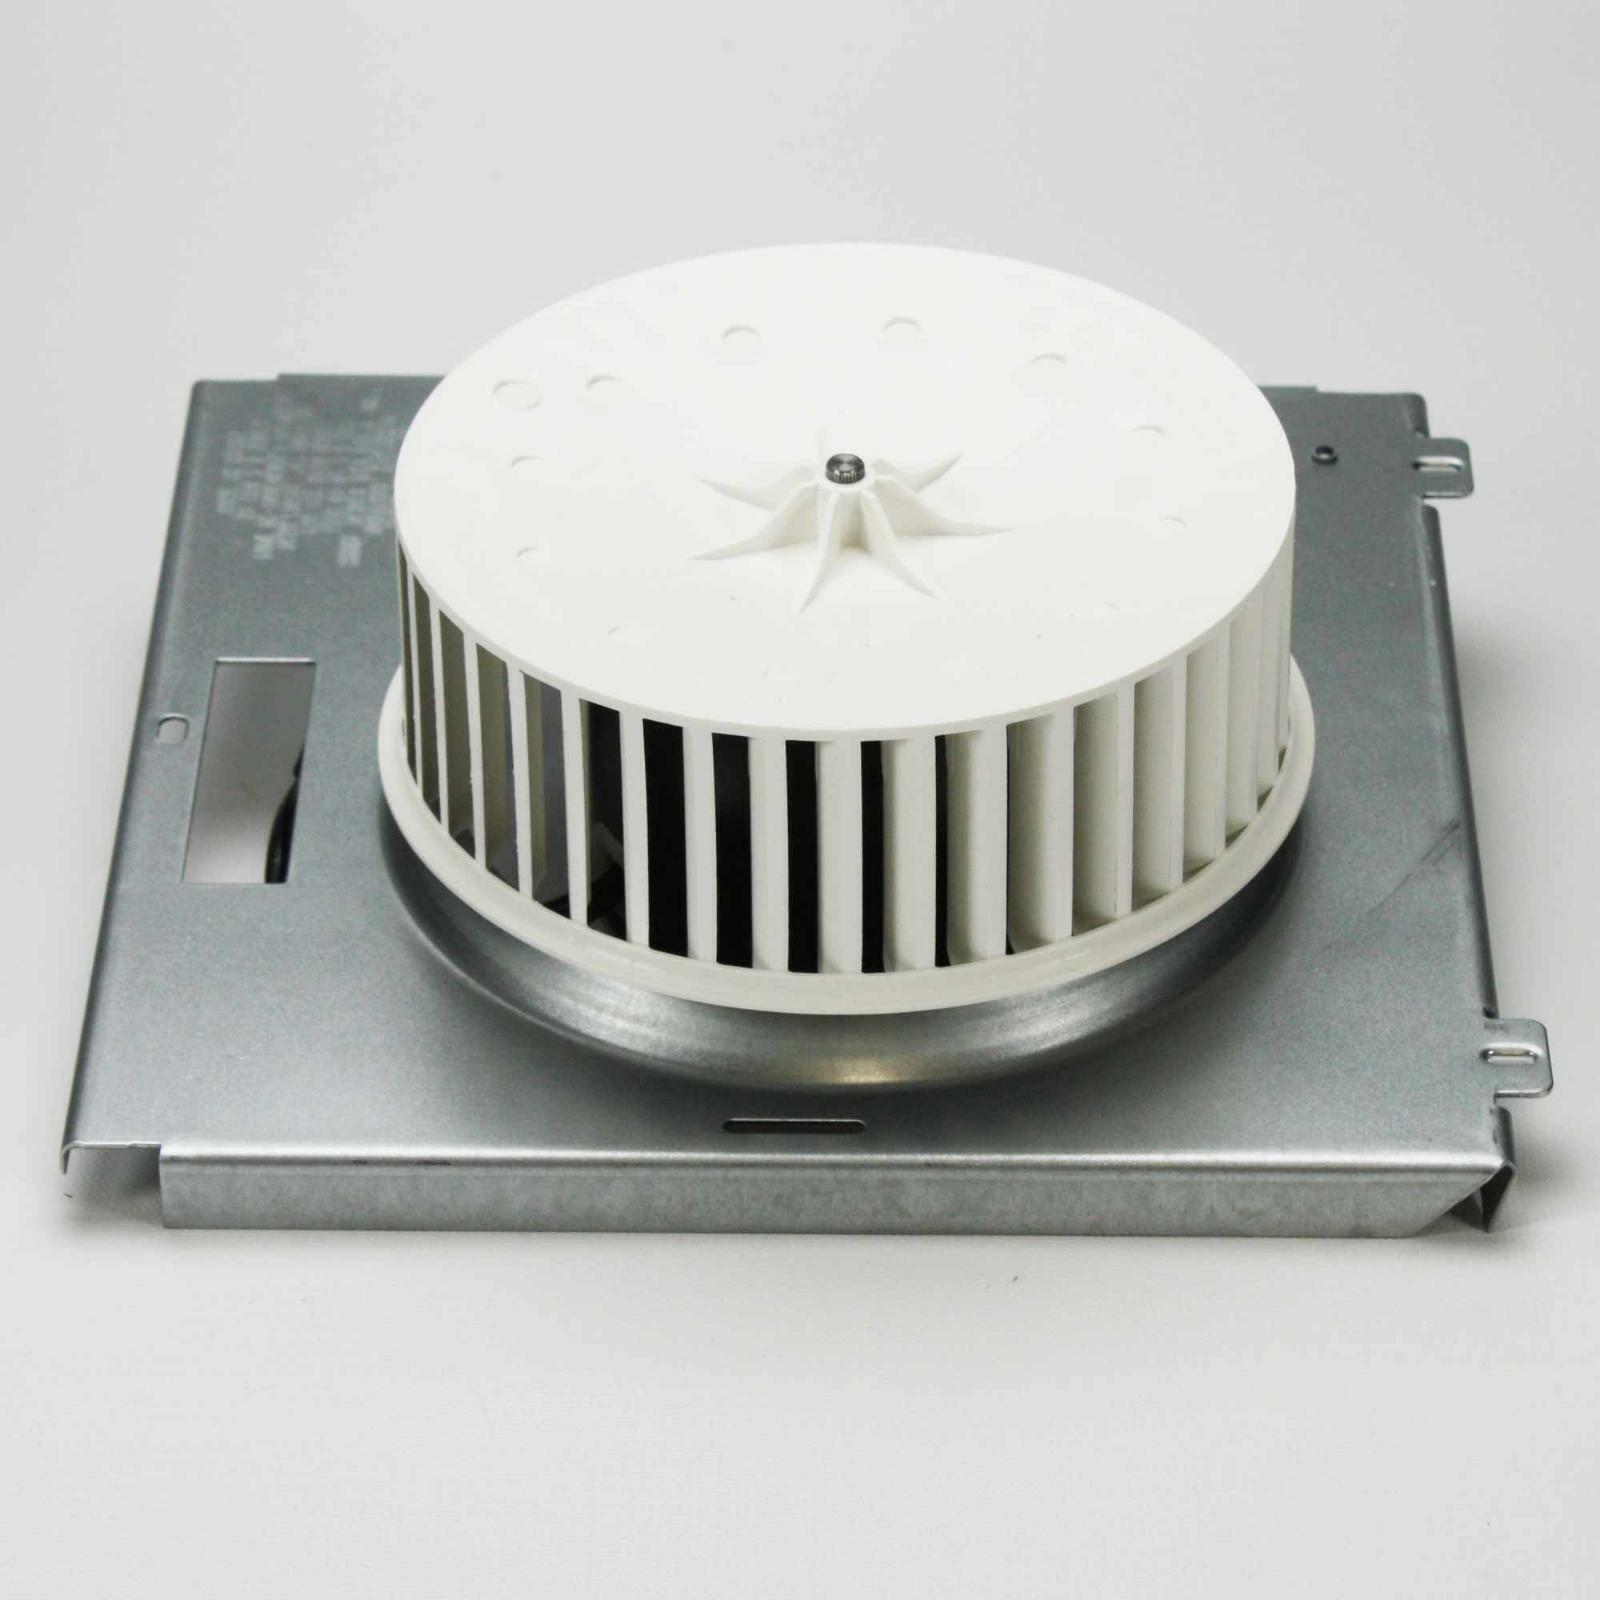 bathroom exhaust fan motor assembly for nutone 8814 8663. Black Bedroom Furniture Sets. Home Design Ideas